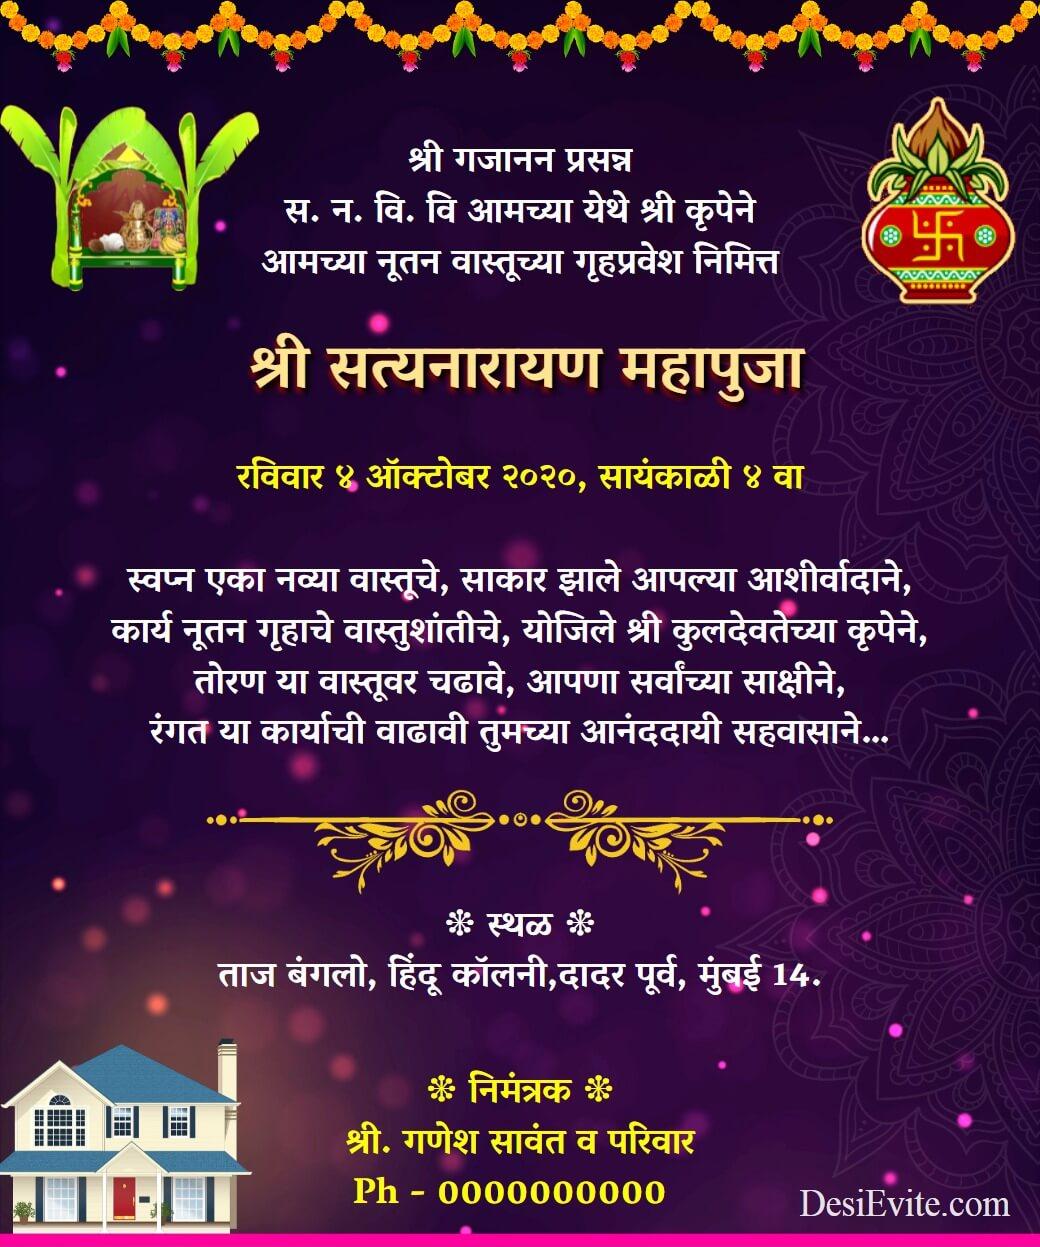 satyanarayan mahapuja invitation card template 72 130